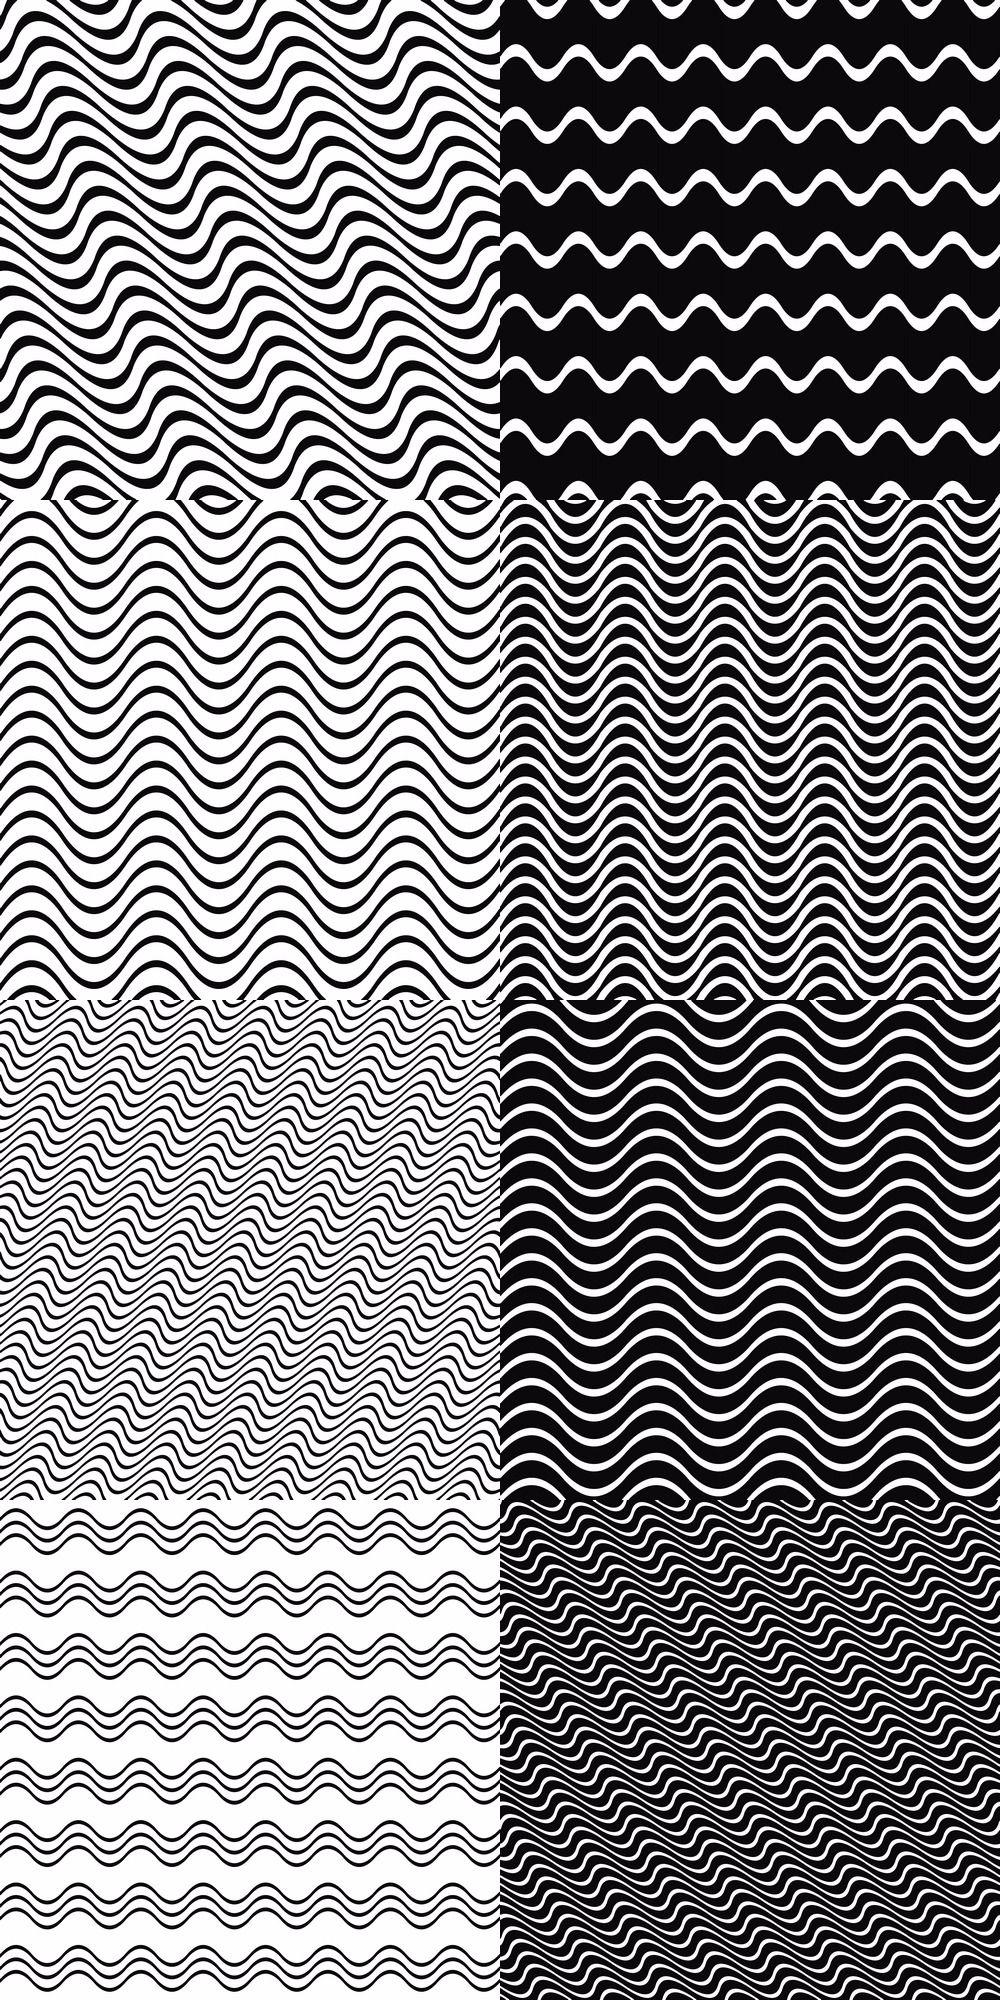 21 Seamless Monochrome Wave Line Pattern Backgrounds Background Patterns Monochrome Pattern Line Patterns